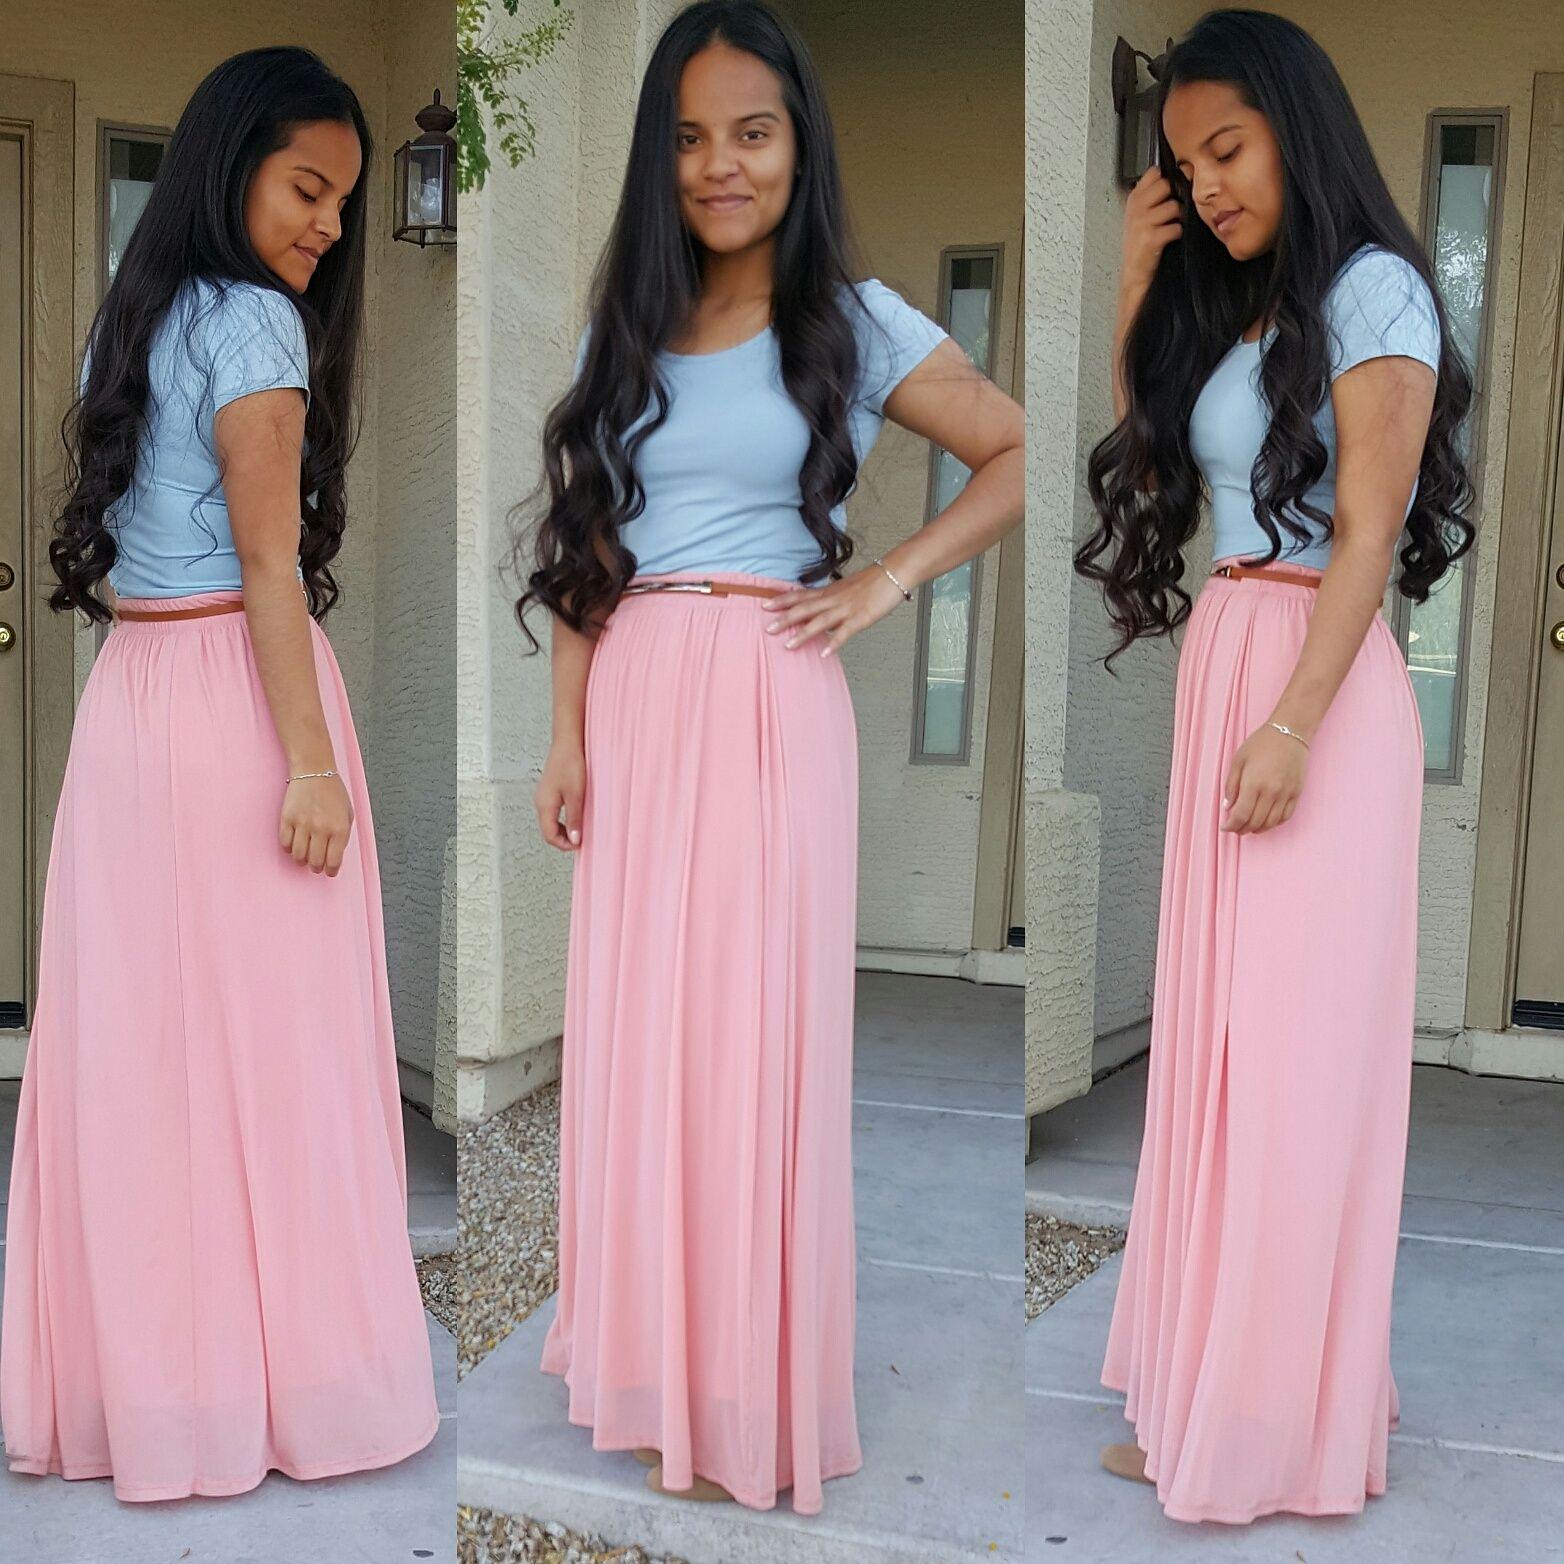 I ❤ pastel colors! | My Style | Pinterest | Ropa cristiana, Falda ...